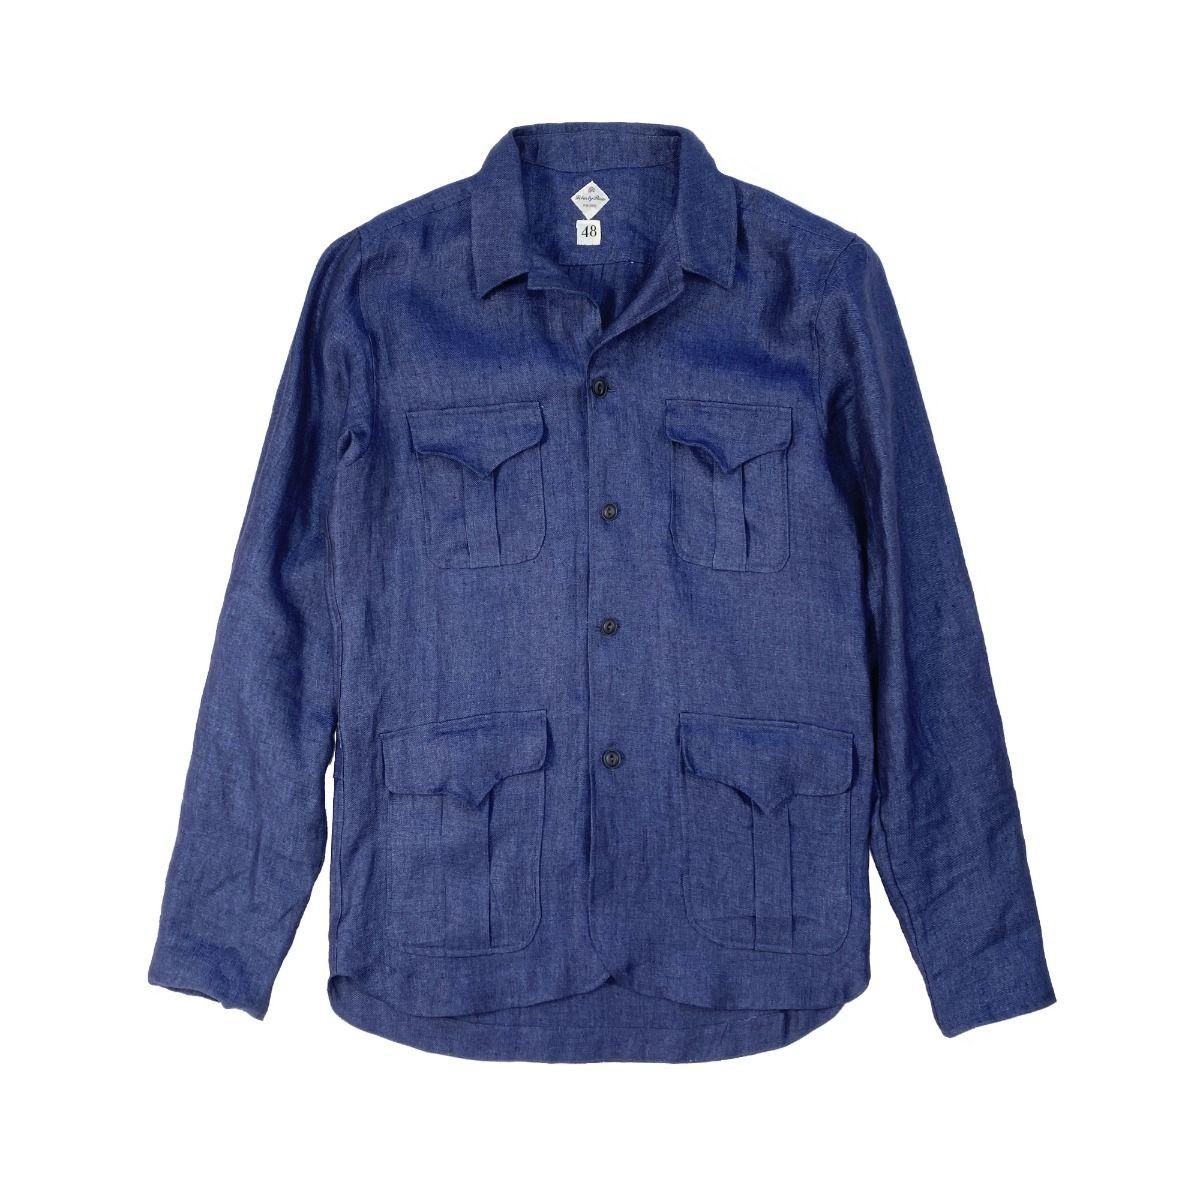 liberty rose marlon uomo giacca-camicia ART021-022